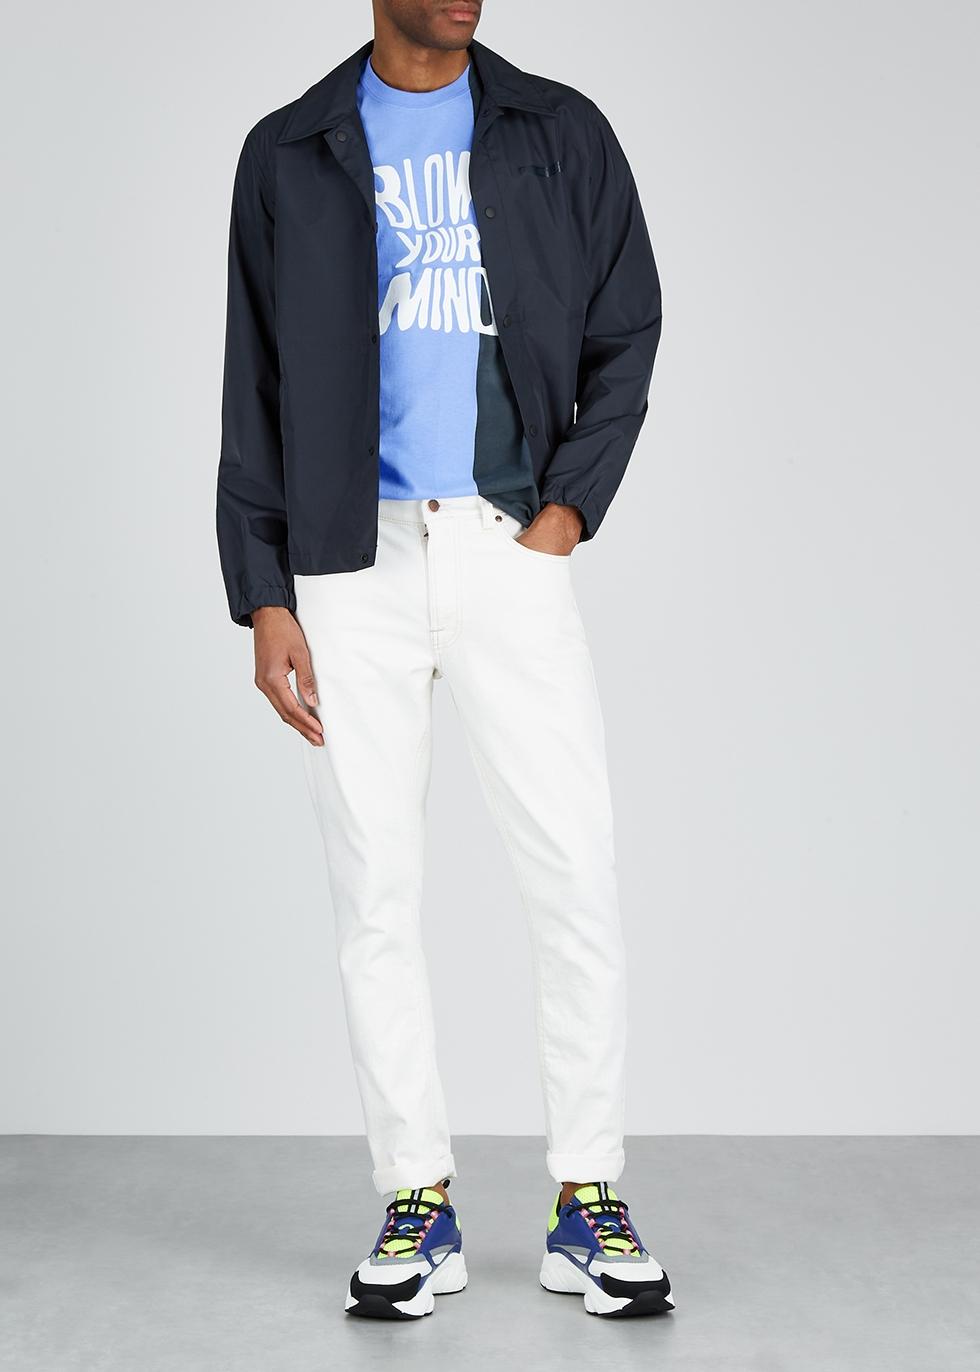 Blue printed cotton T-shirt - Darkoveli